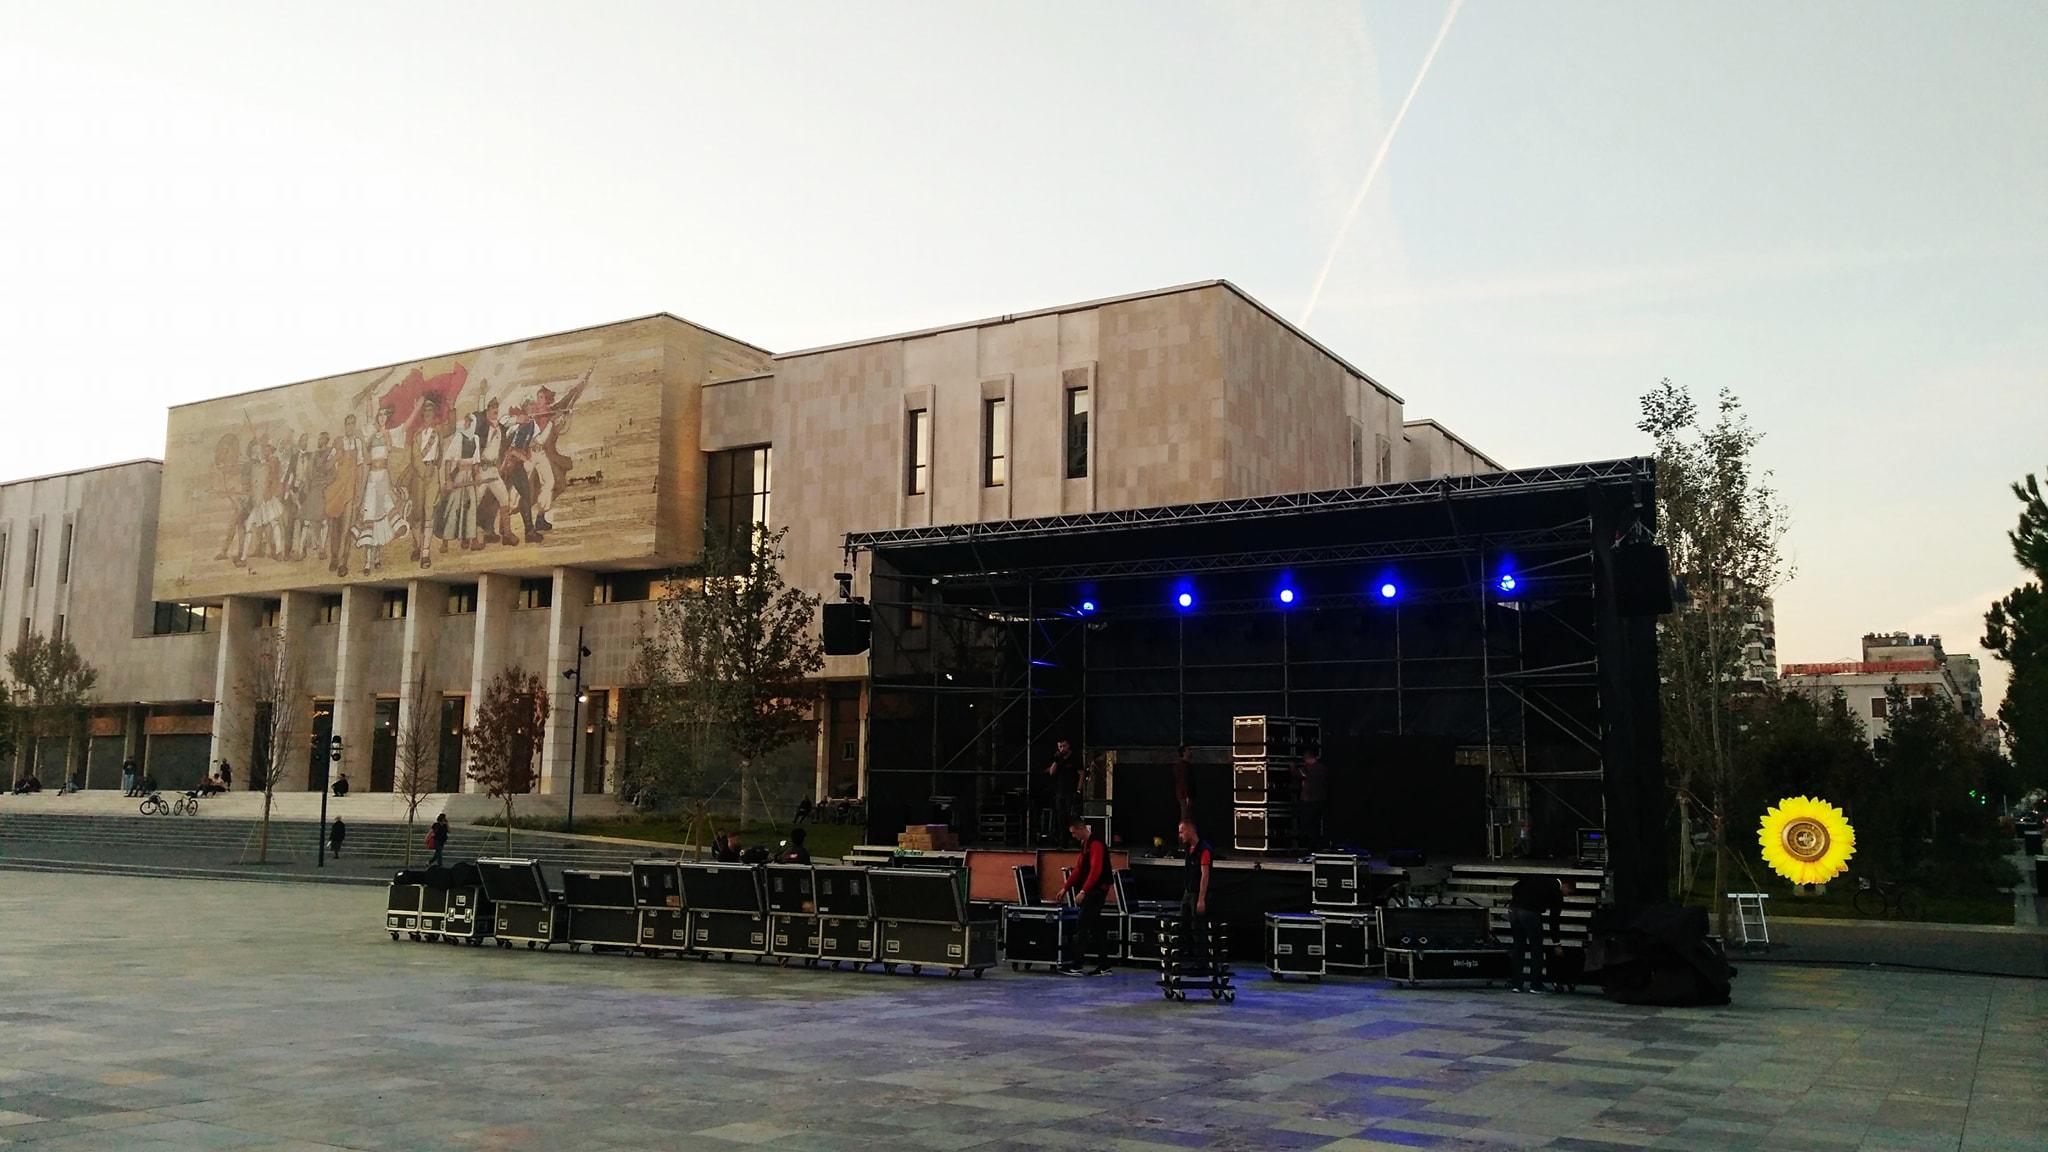 Preperation for tonight's Vjosa concert in Tirana © Cornelia Wieser